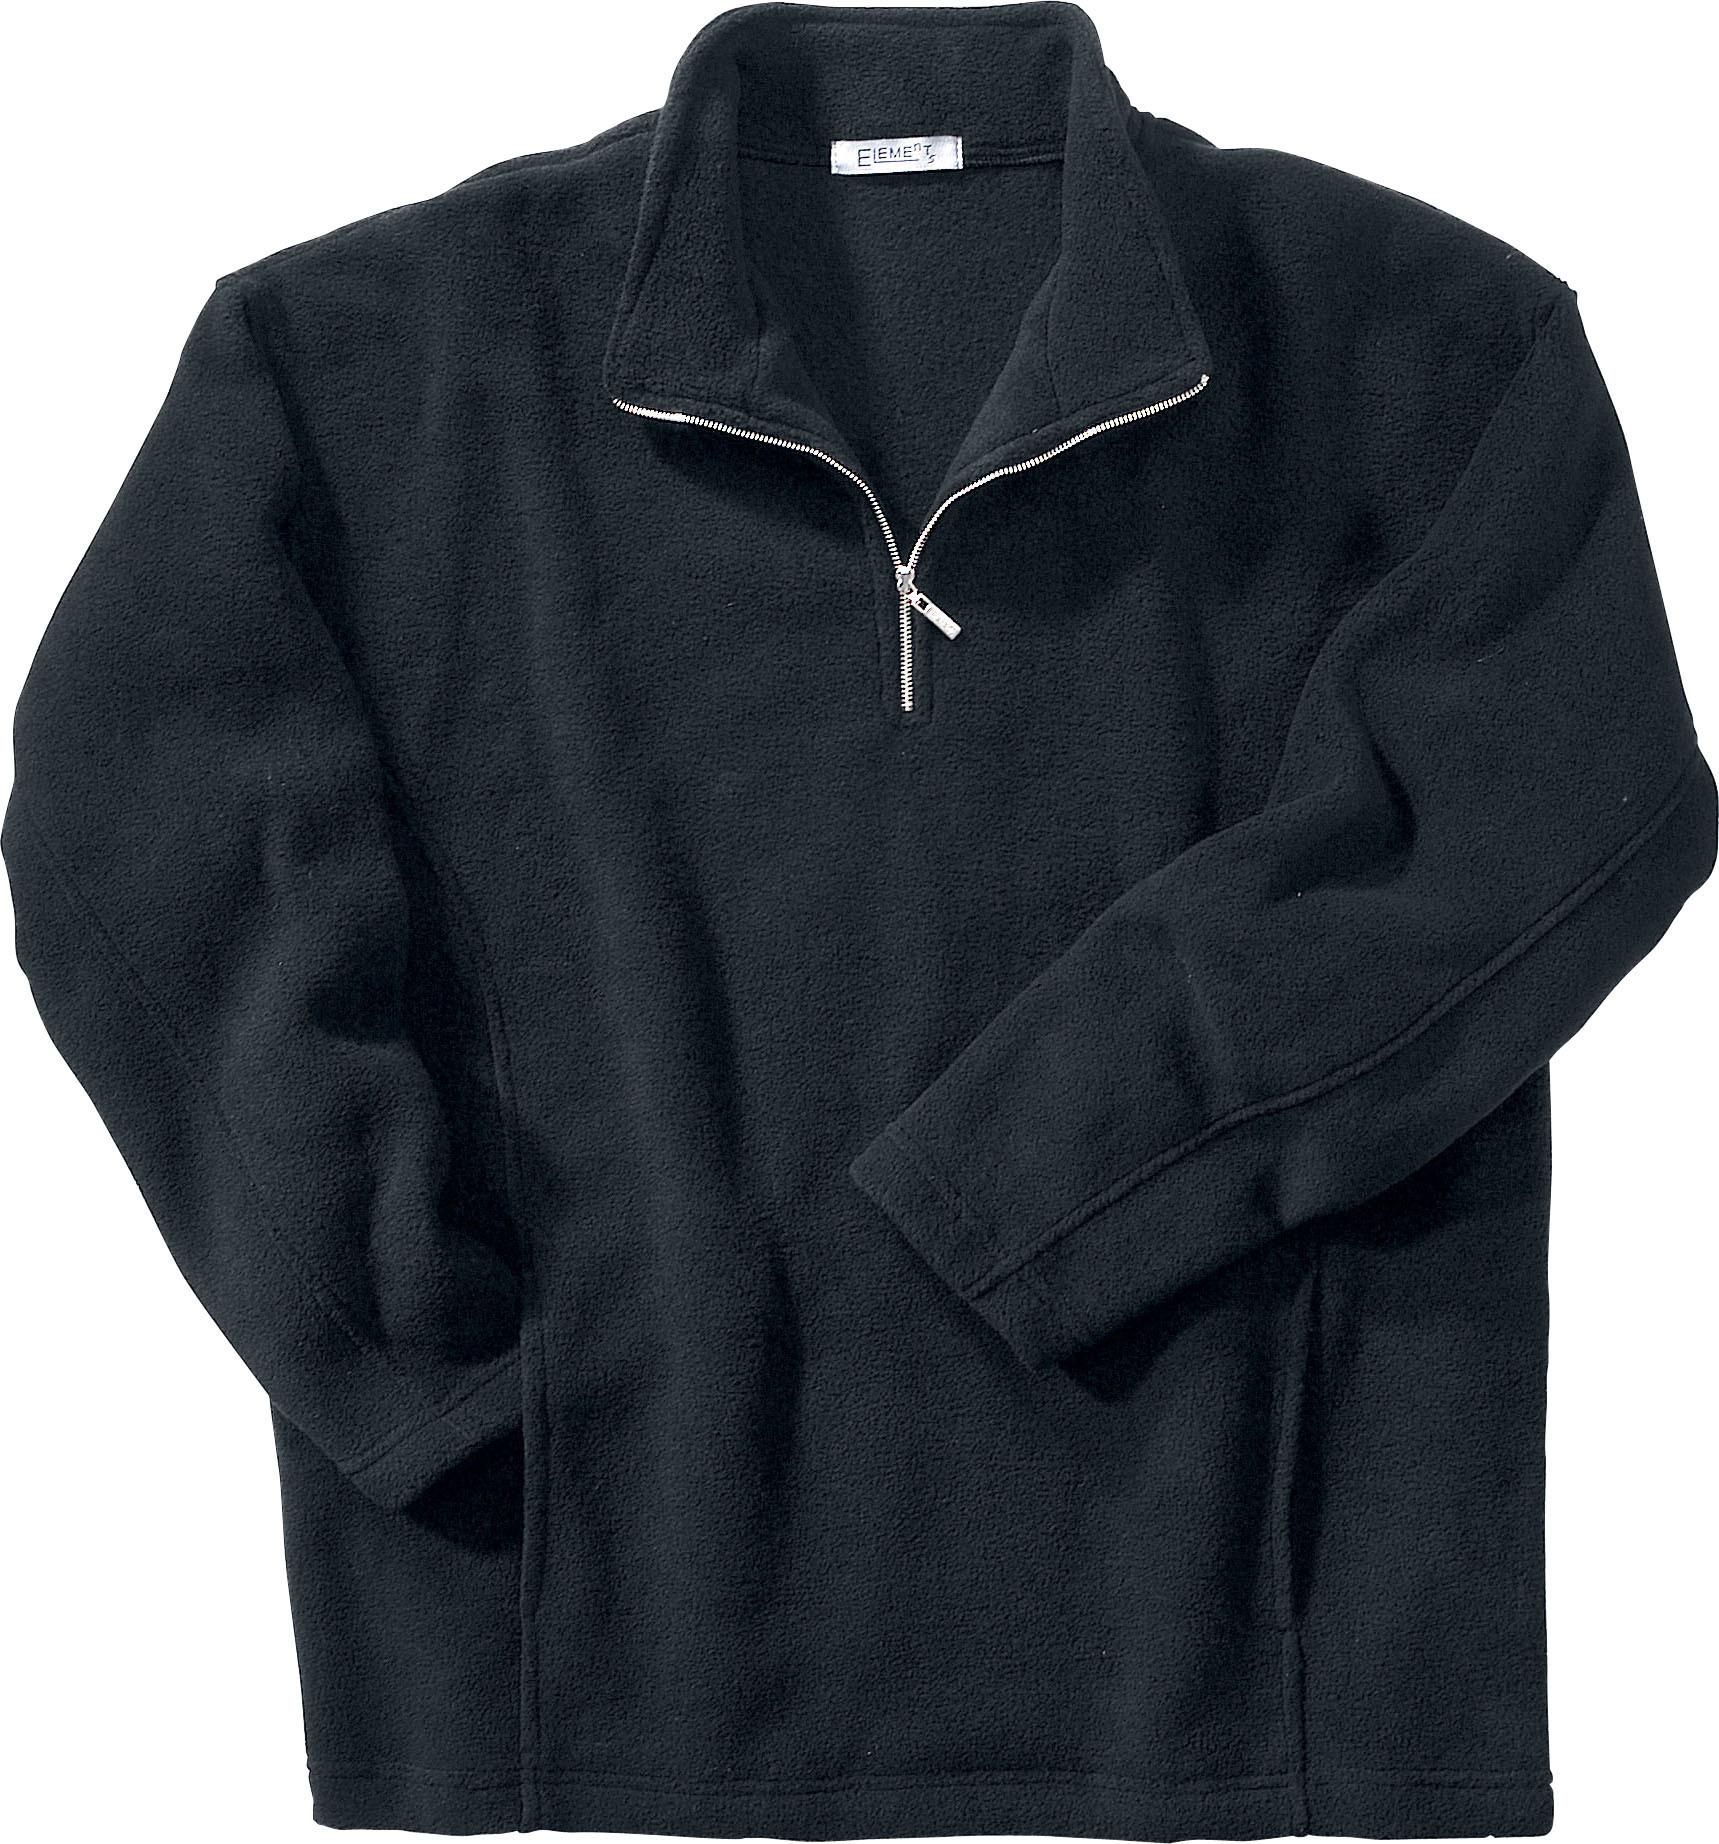 Ash City Poly Fleece 221434 - Men's Solid Polyester ...